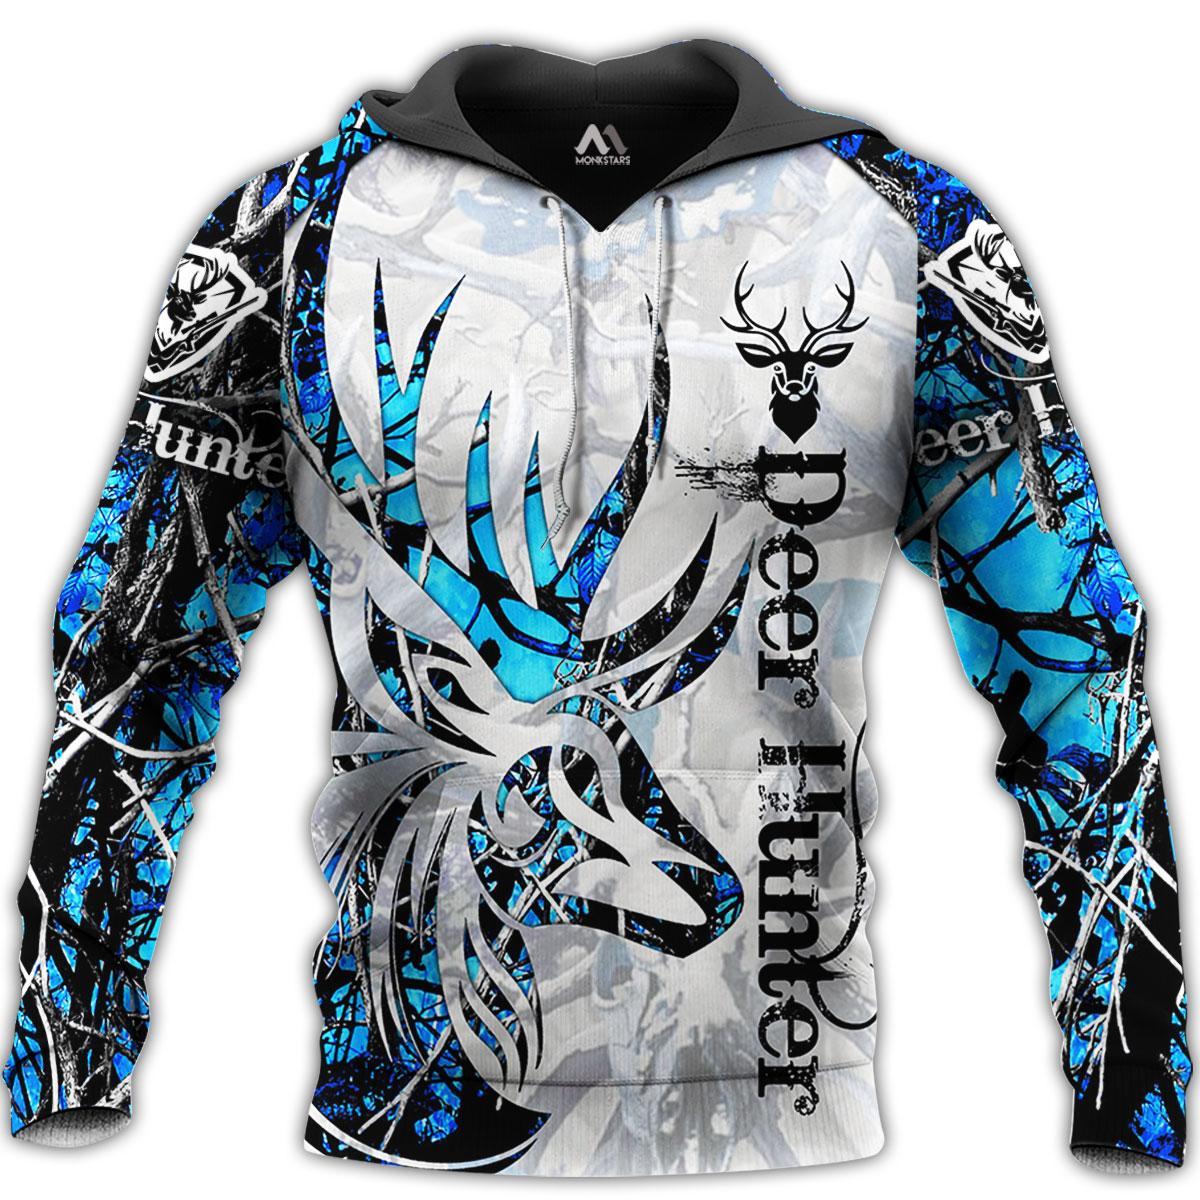 Deer tattoo blue camo 3d all over printed hoodie - maria